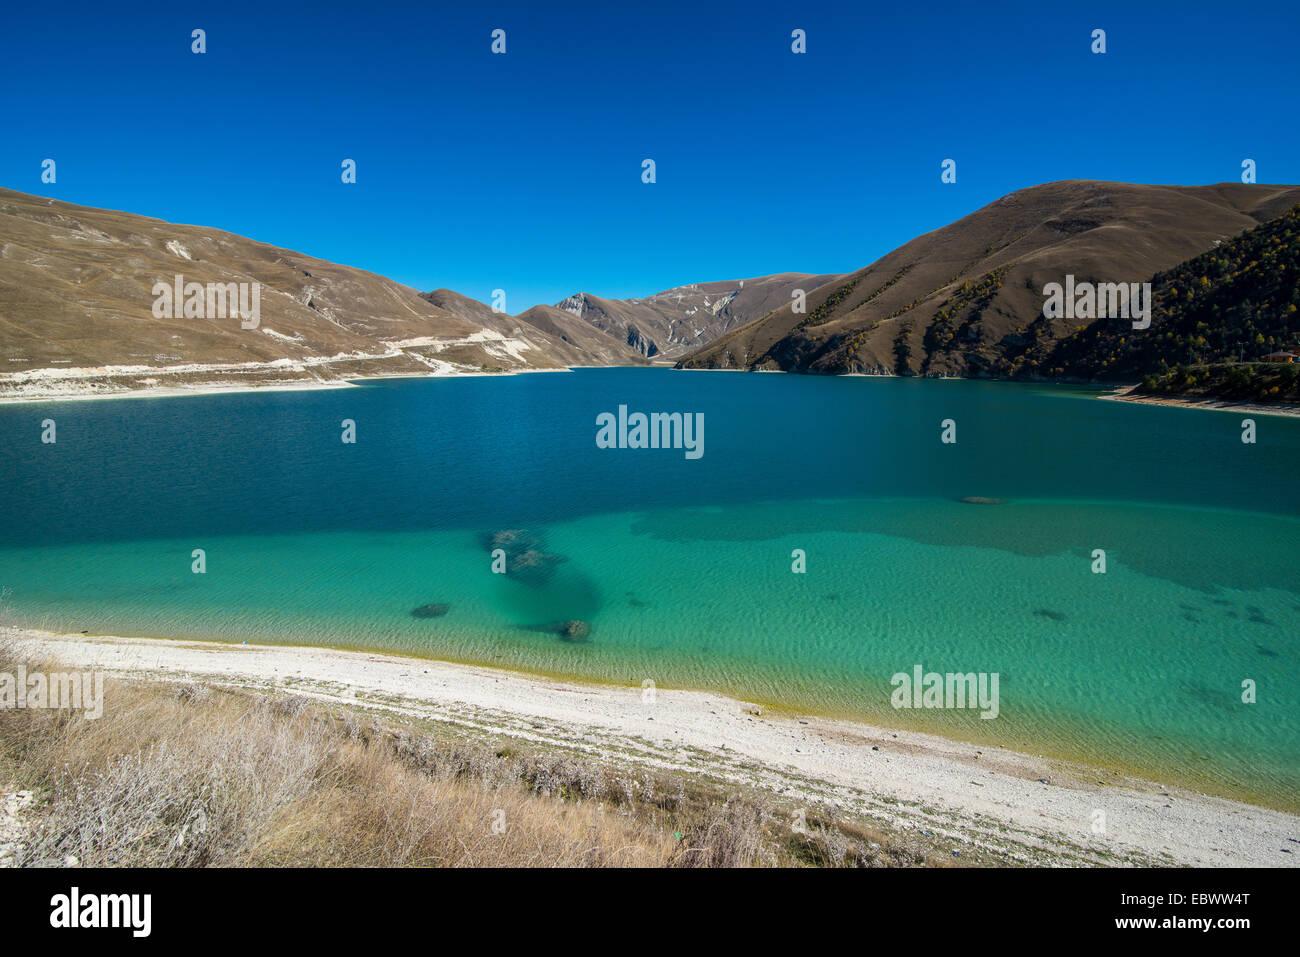 Lake Kezenoyam in the Chechen mountains, Chechnya, Caucasus, Russia - Stock Image